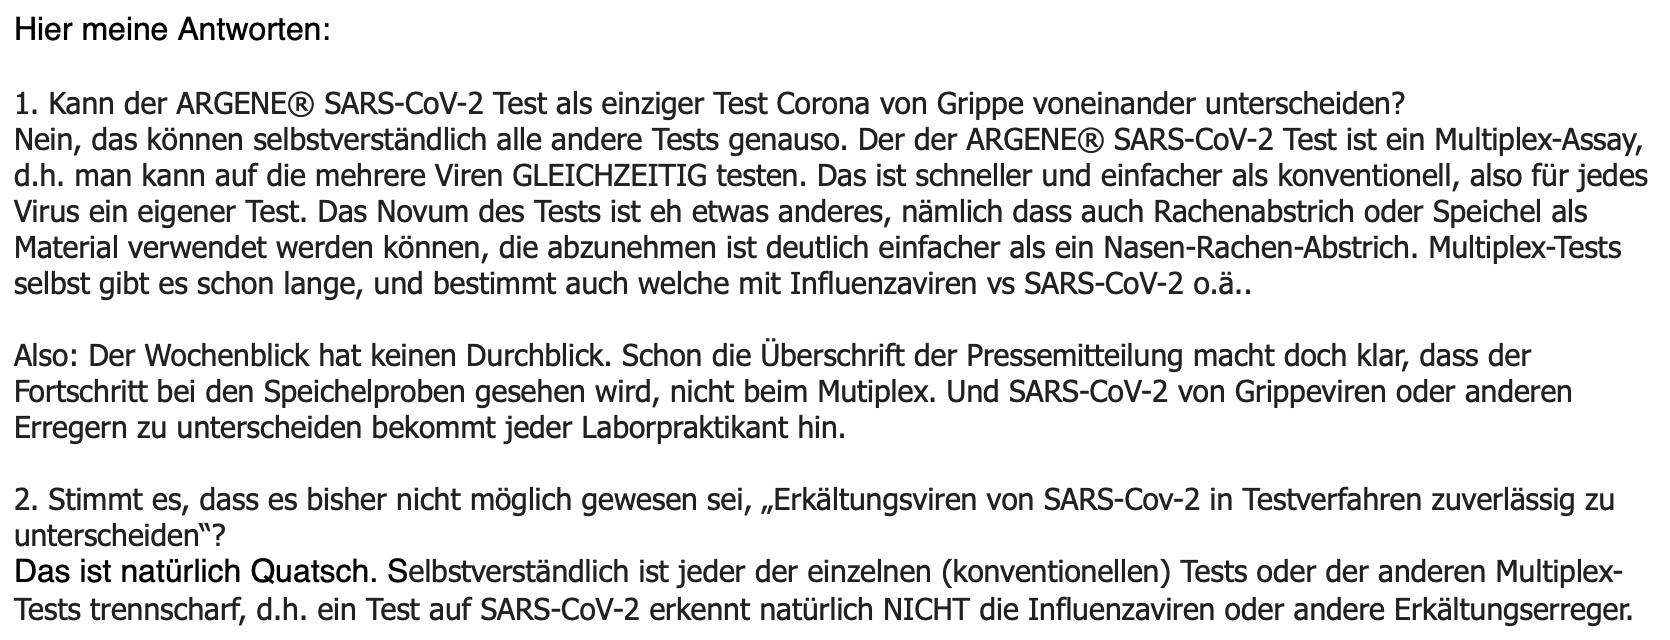 E-Mail von Virologe Friedemann Weber.